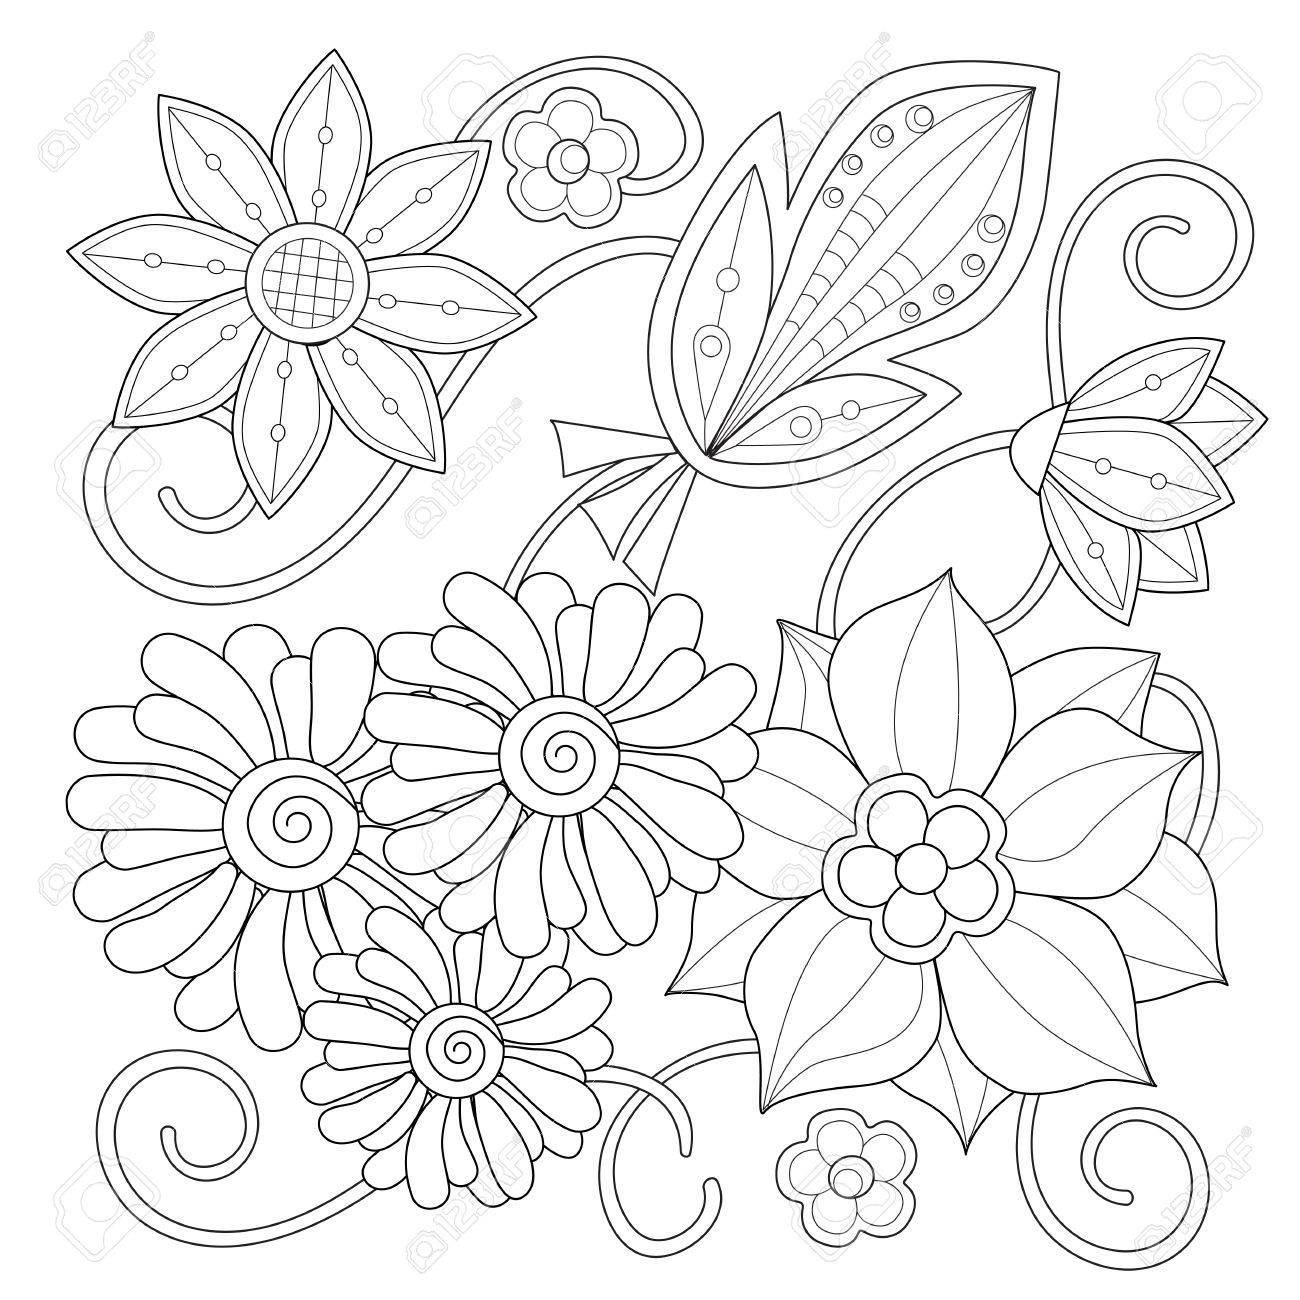 Dorable Flores Para Colorear Imprimibles Motivo - Dibujos Para ...